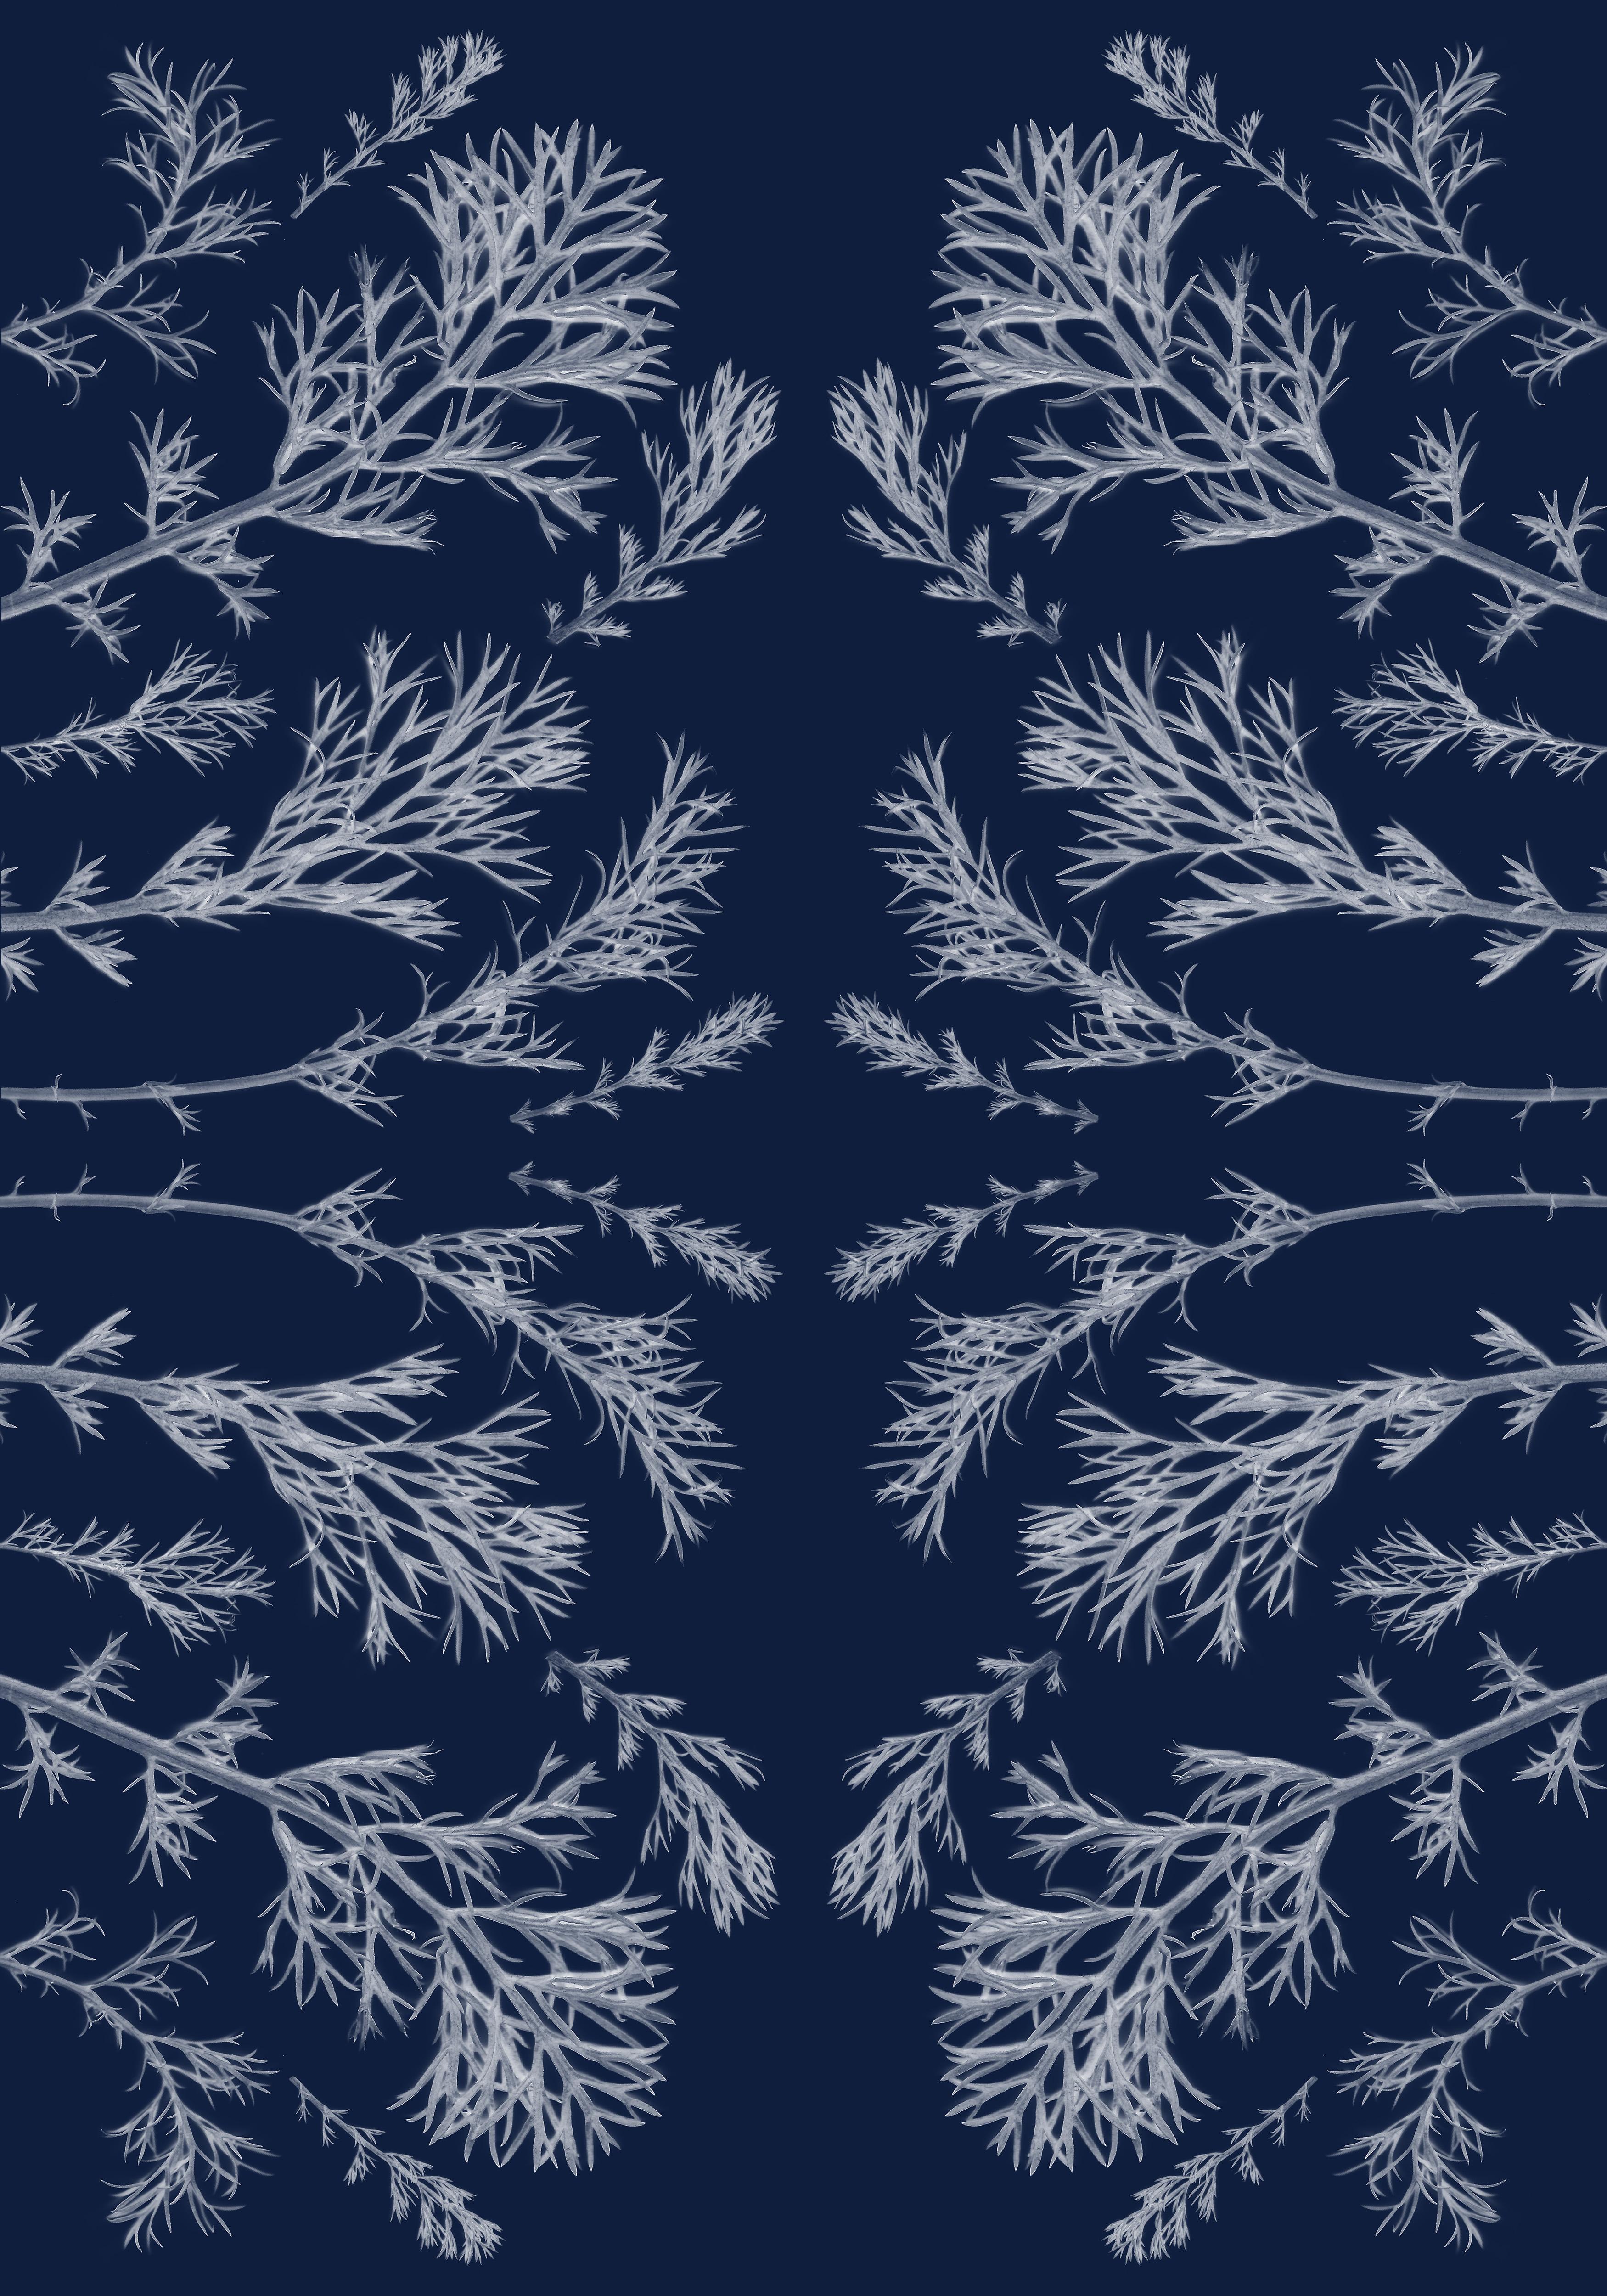 Plant pressed Cyanotype, Kaleidoscopic, Handmade in Sunlight, Limited Edition